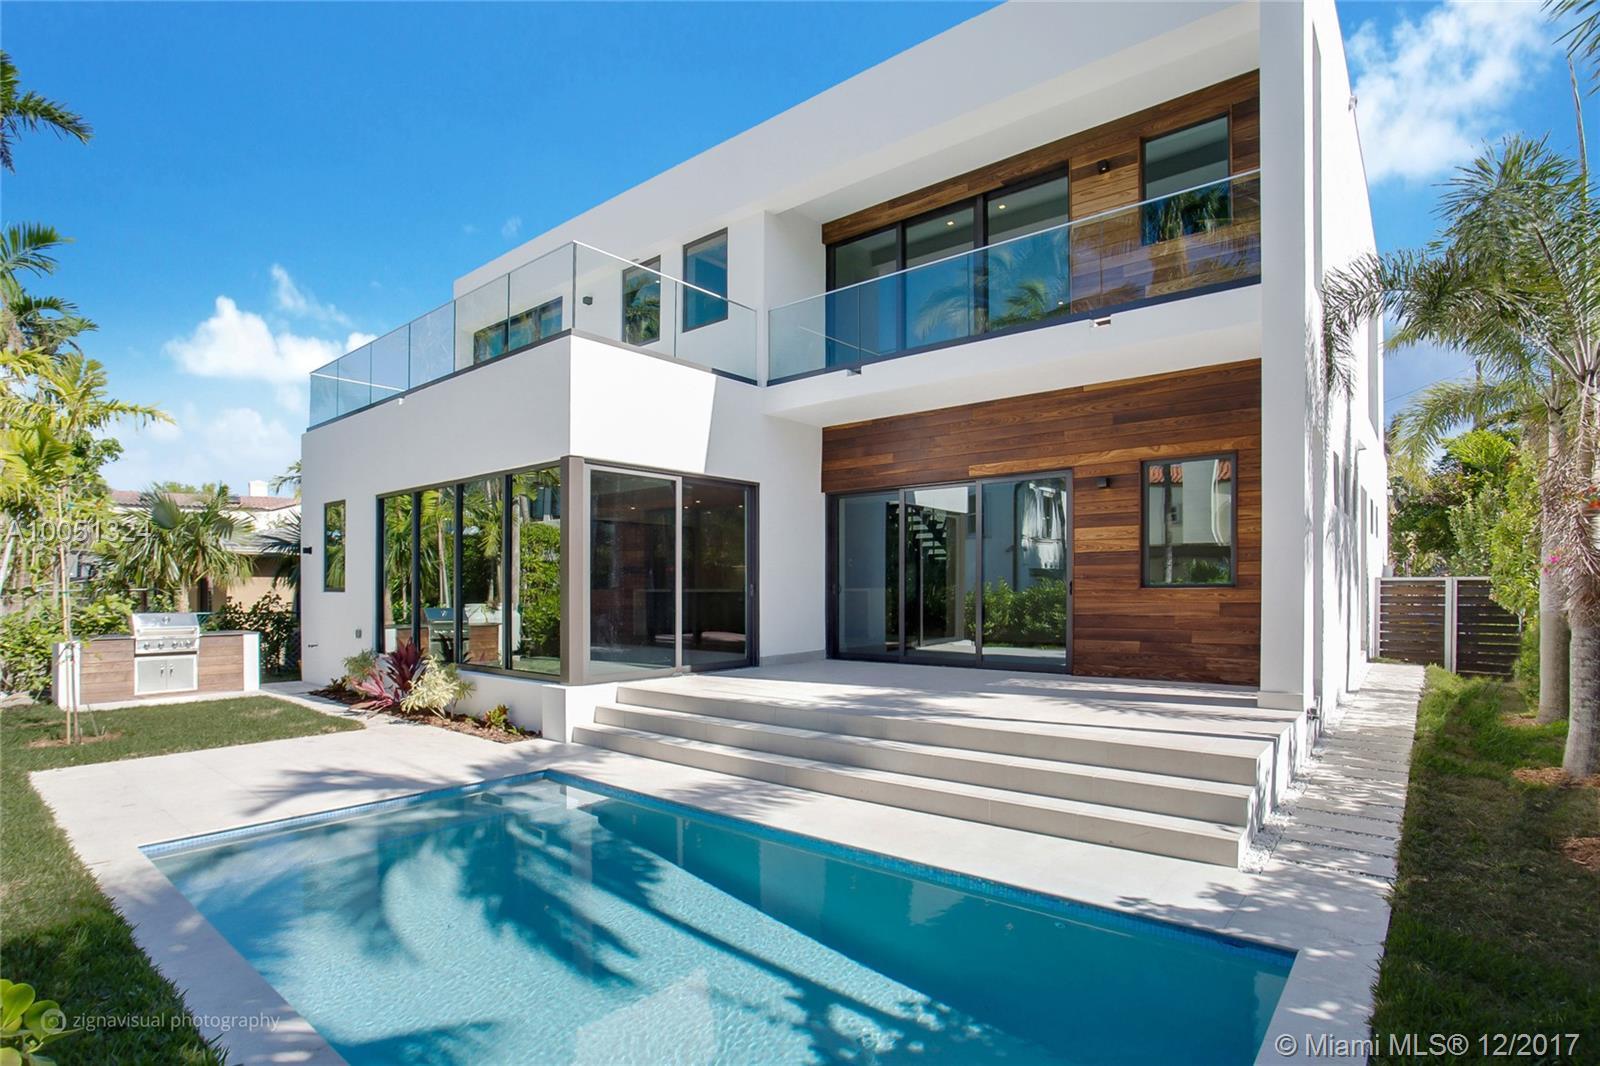 Miami beach fl immobilier 5807 usa acheter des maisons for Acheter maison usa